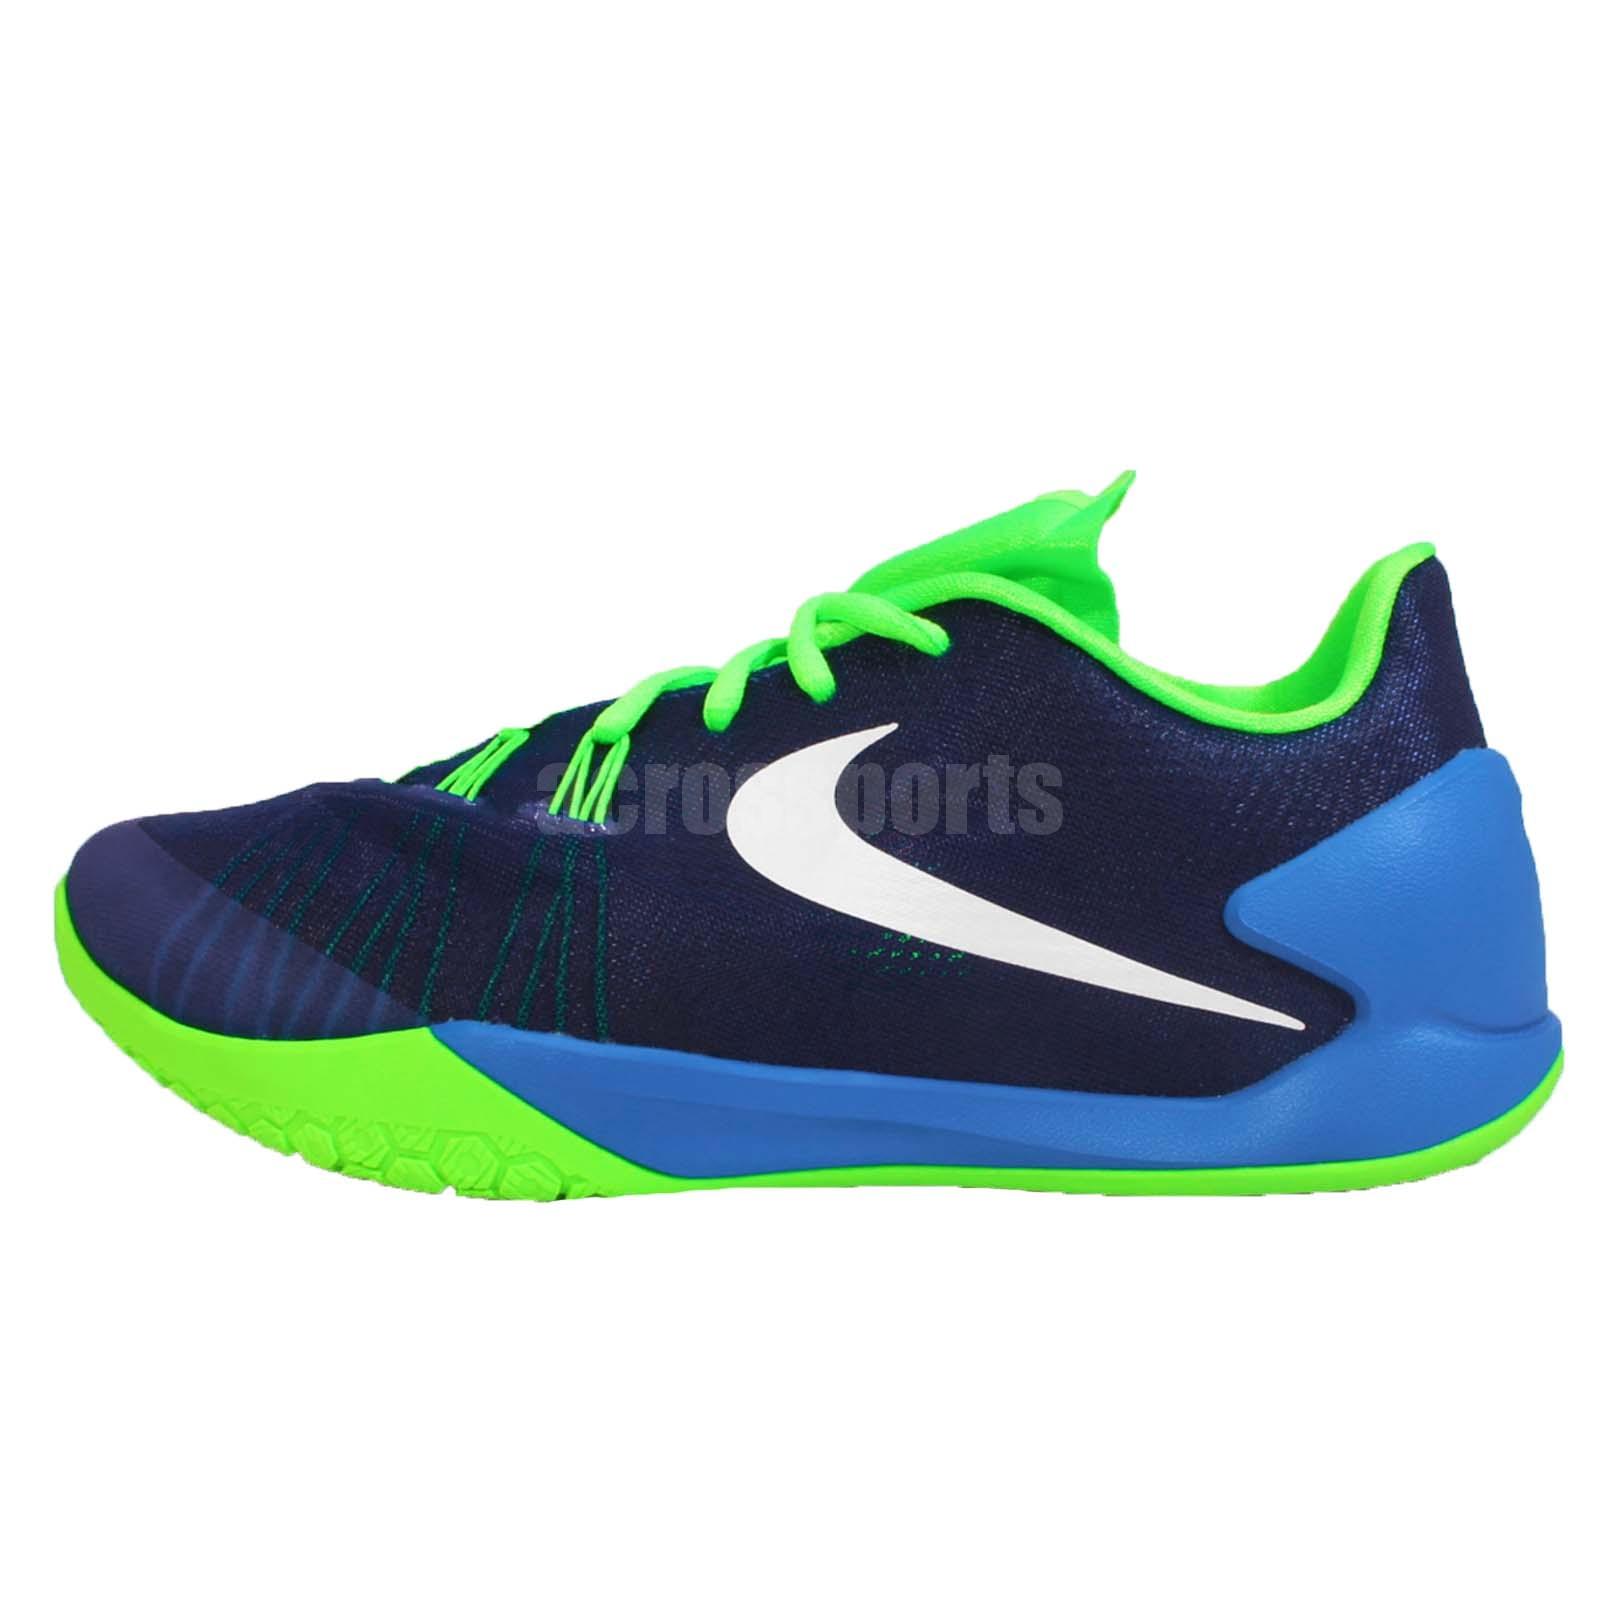 James Harden Nike Shoes: Nike Hyperchase EP Sprite Blue Green James Harden